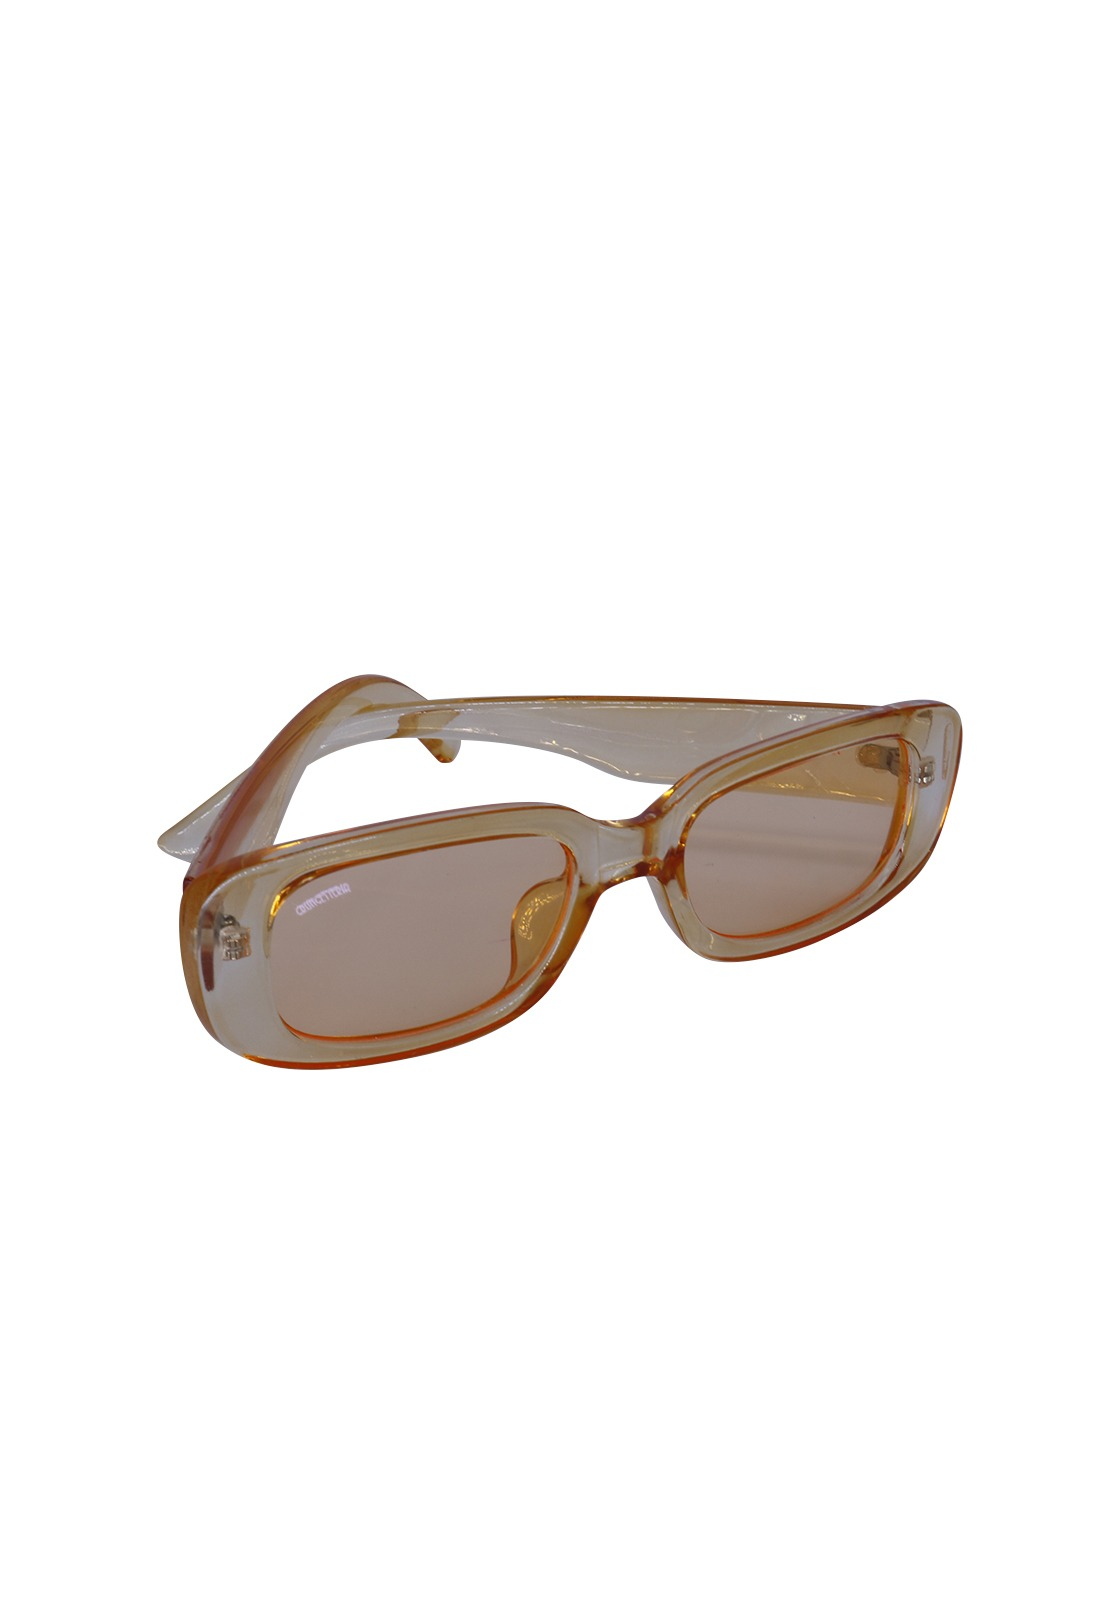 Óculos de Sol Grungetteria Fresh Ambar